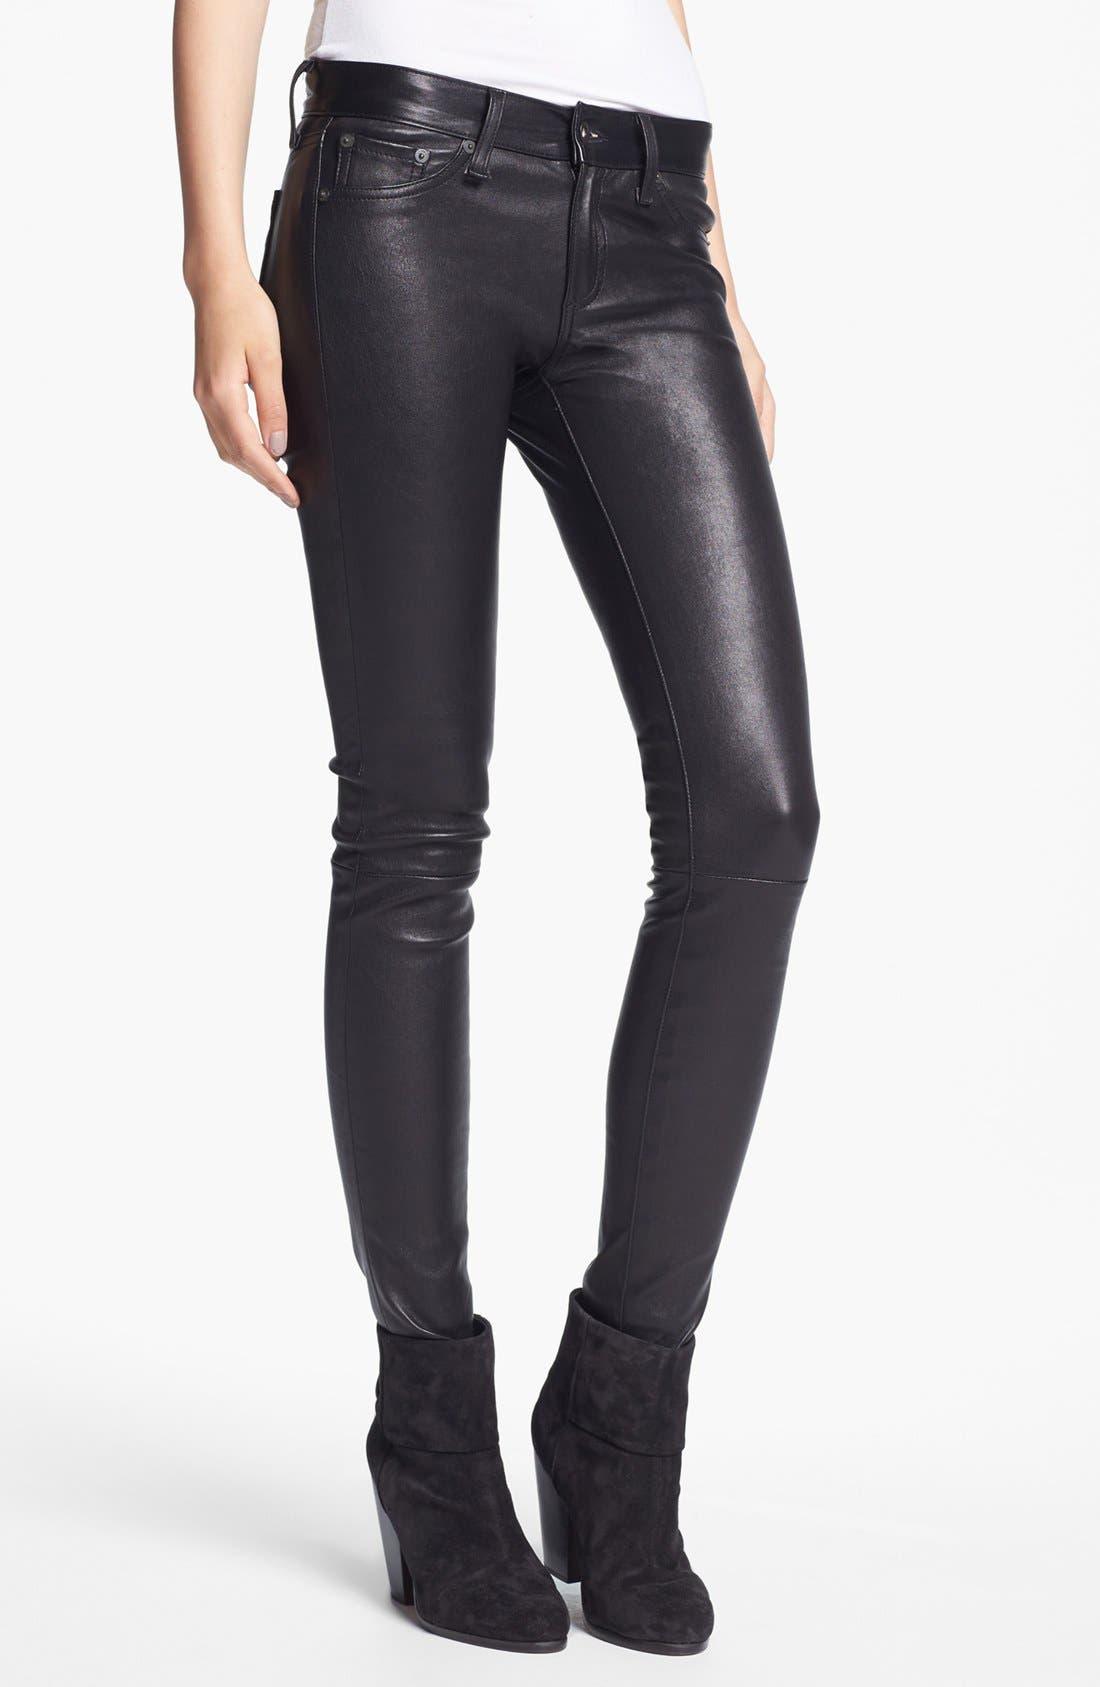 Main Image - rag & bone 'The Leather Skinny' Pants